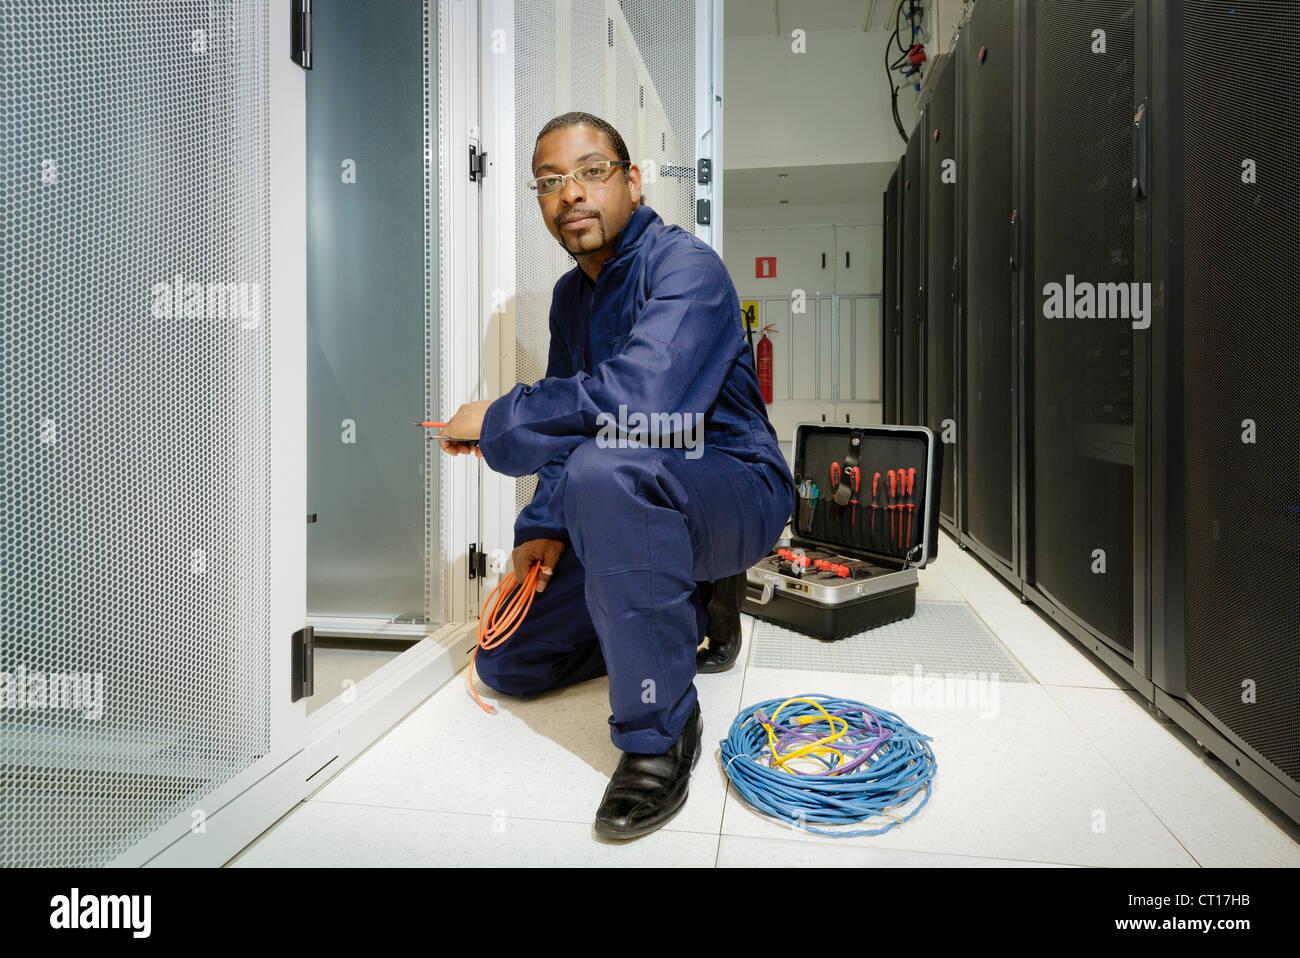 Technician working in server room - Stock Image